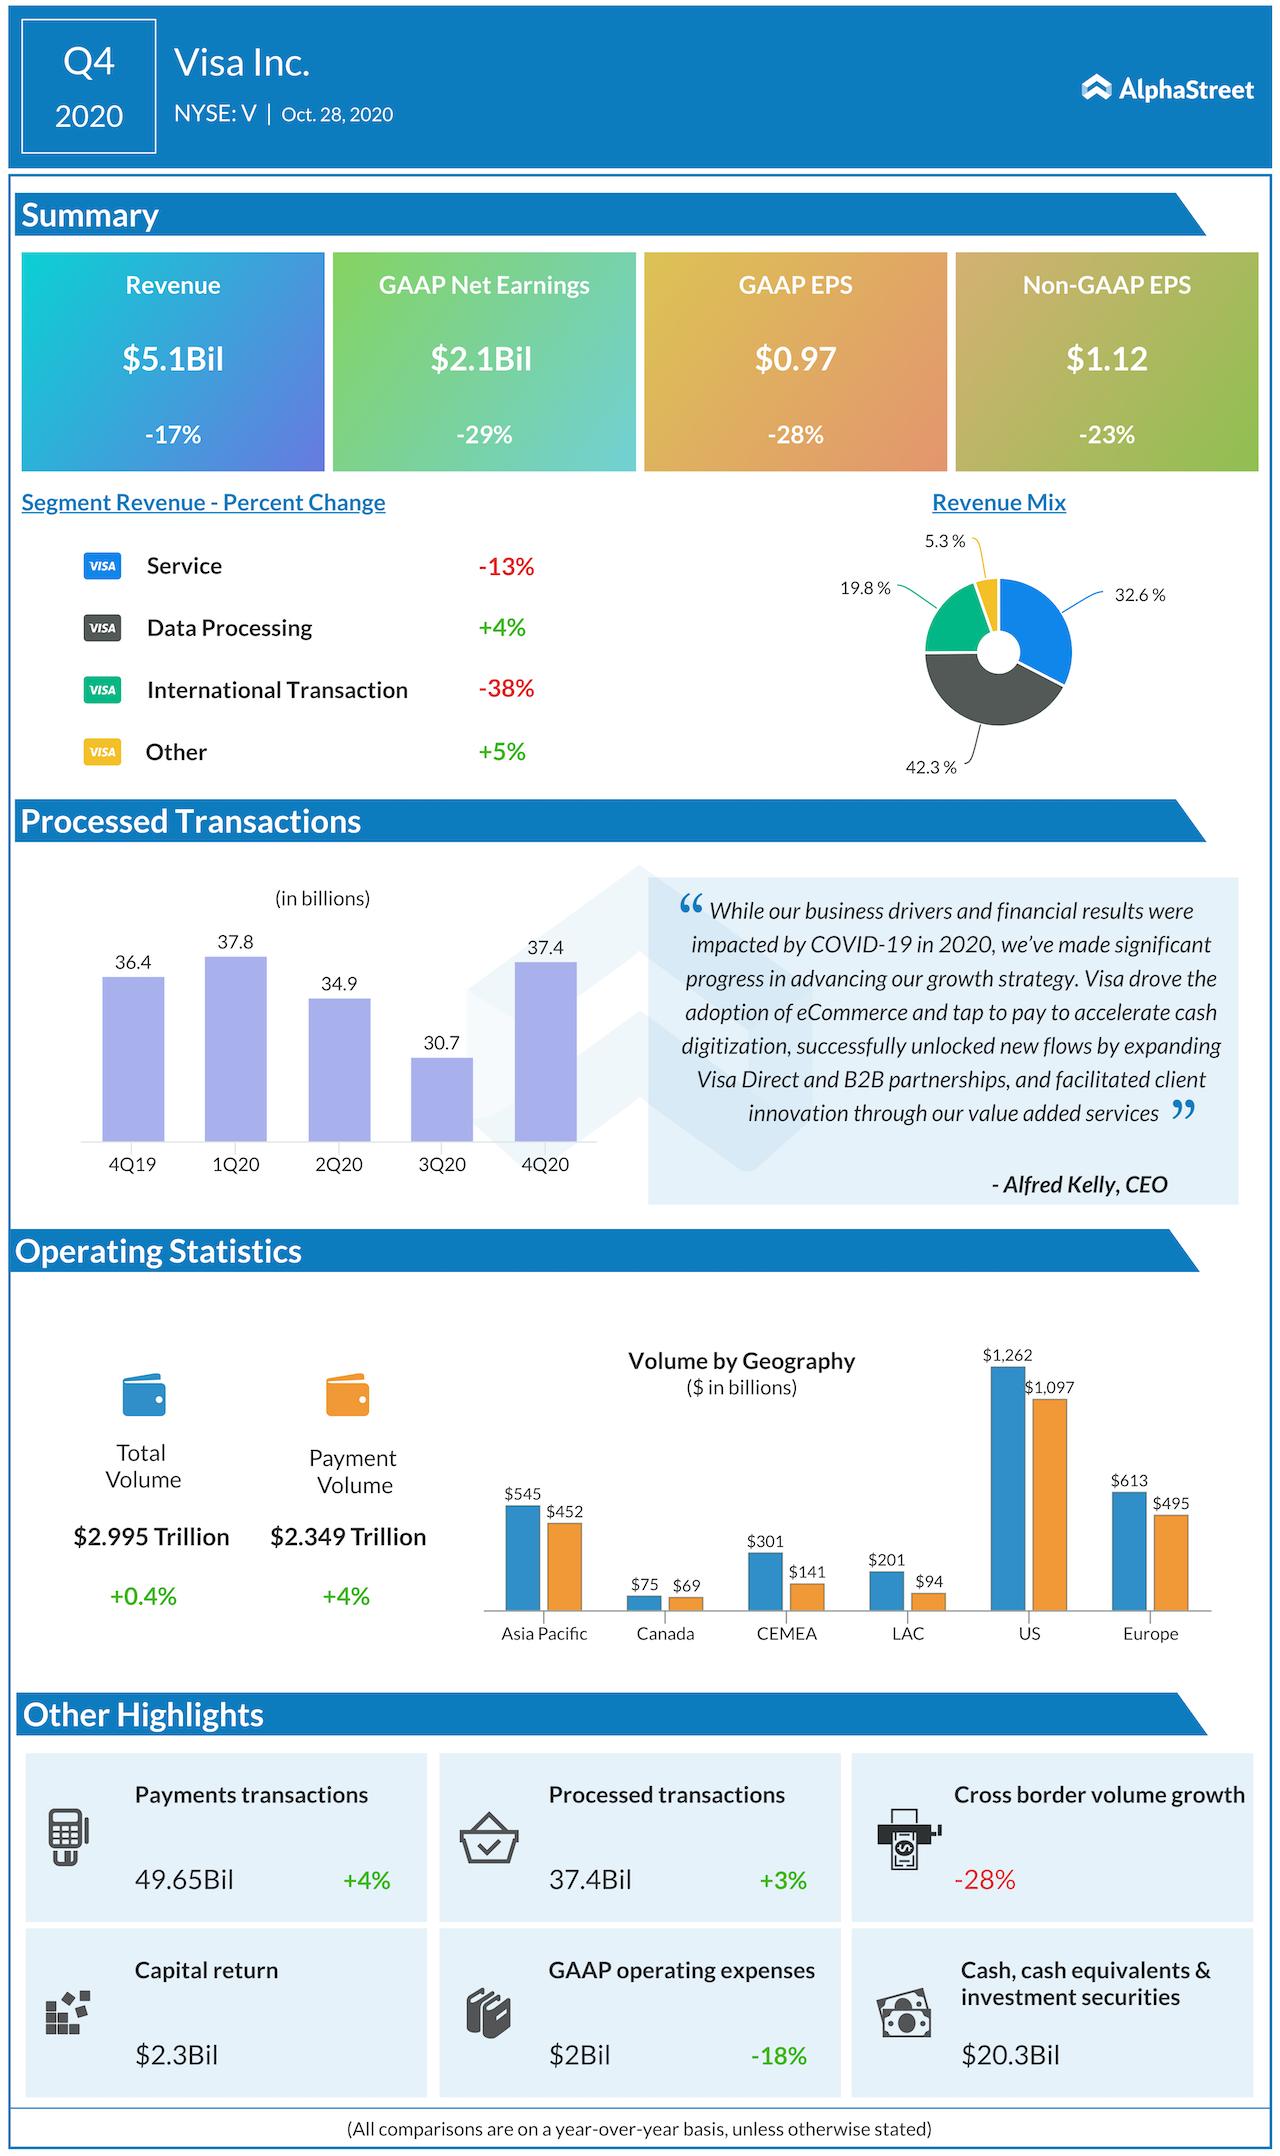 Visa Q4 2020 earnings